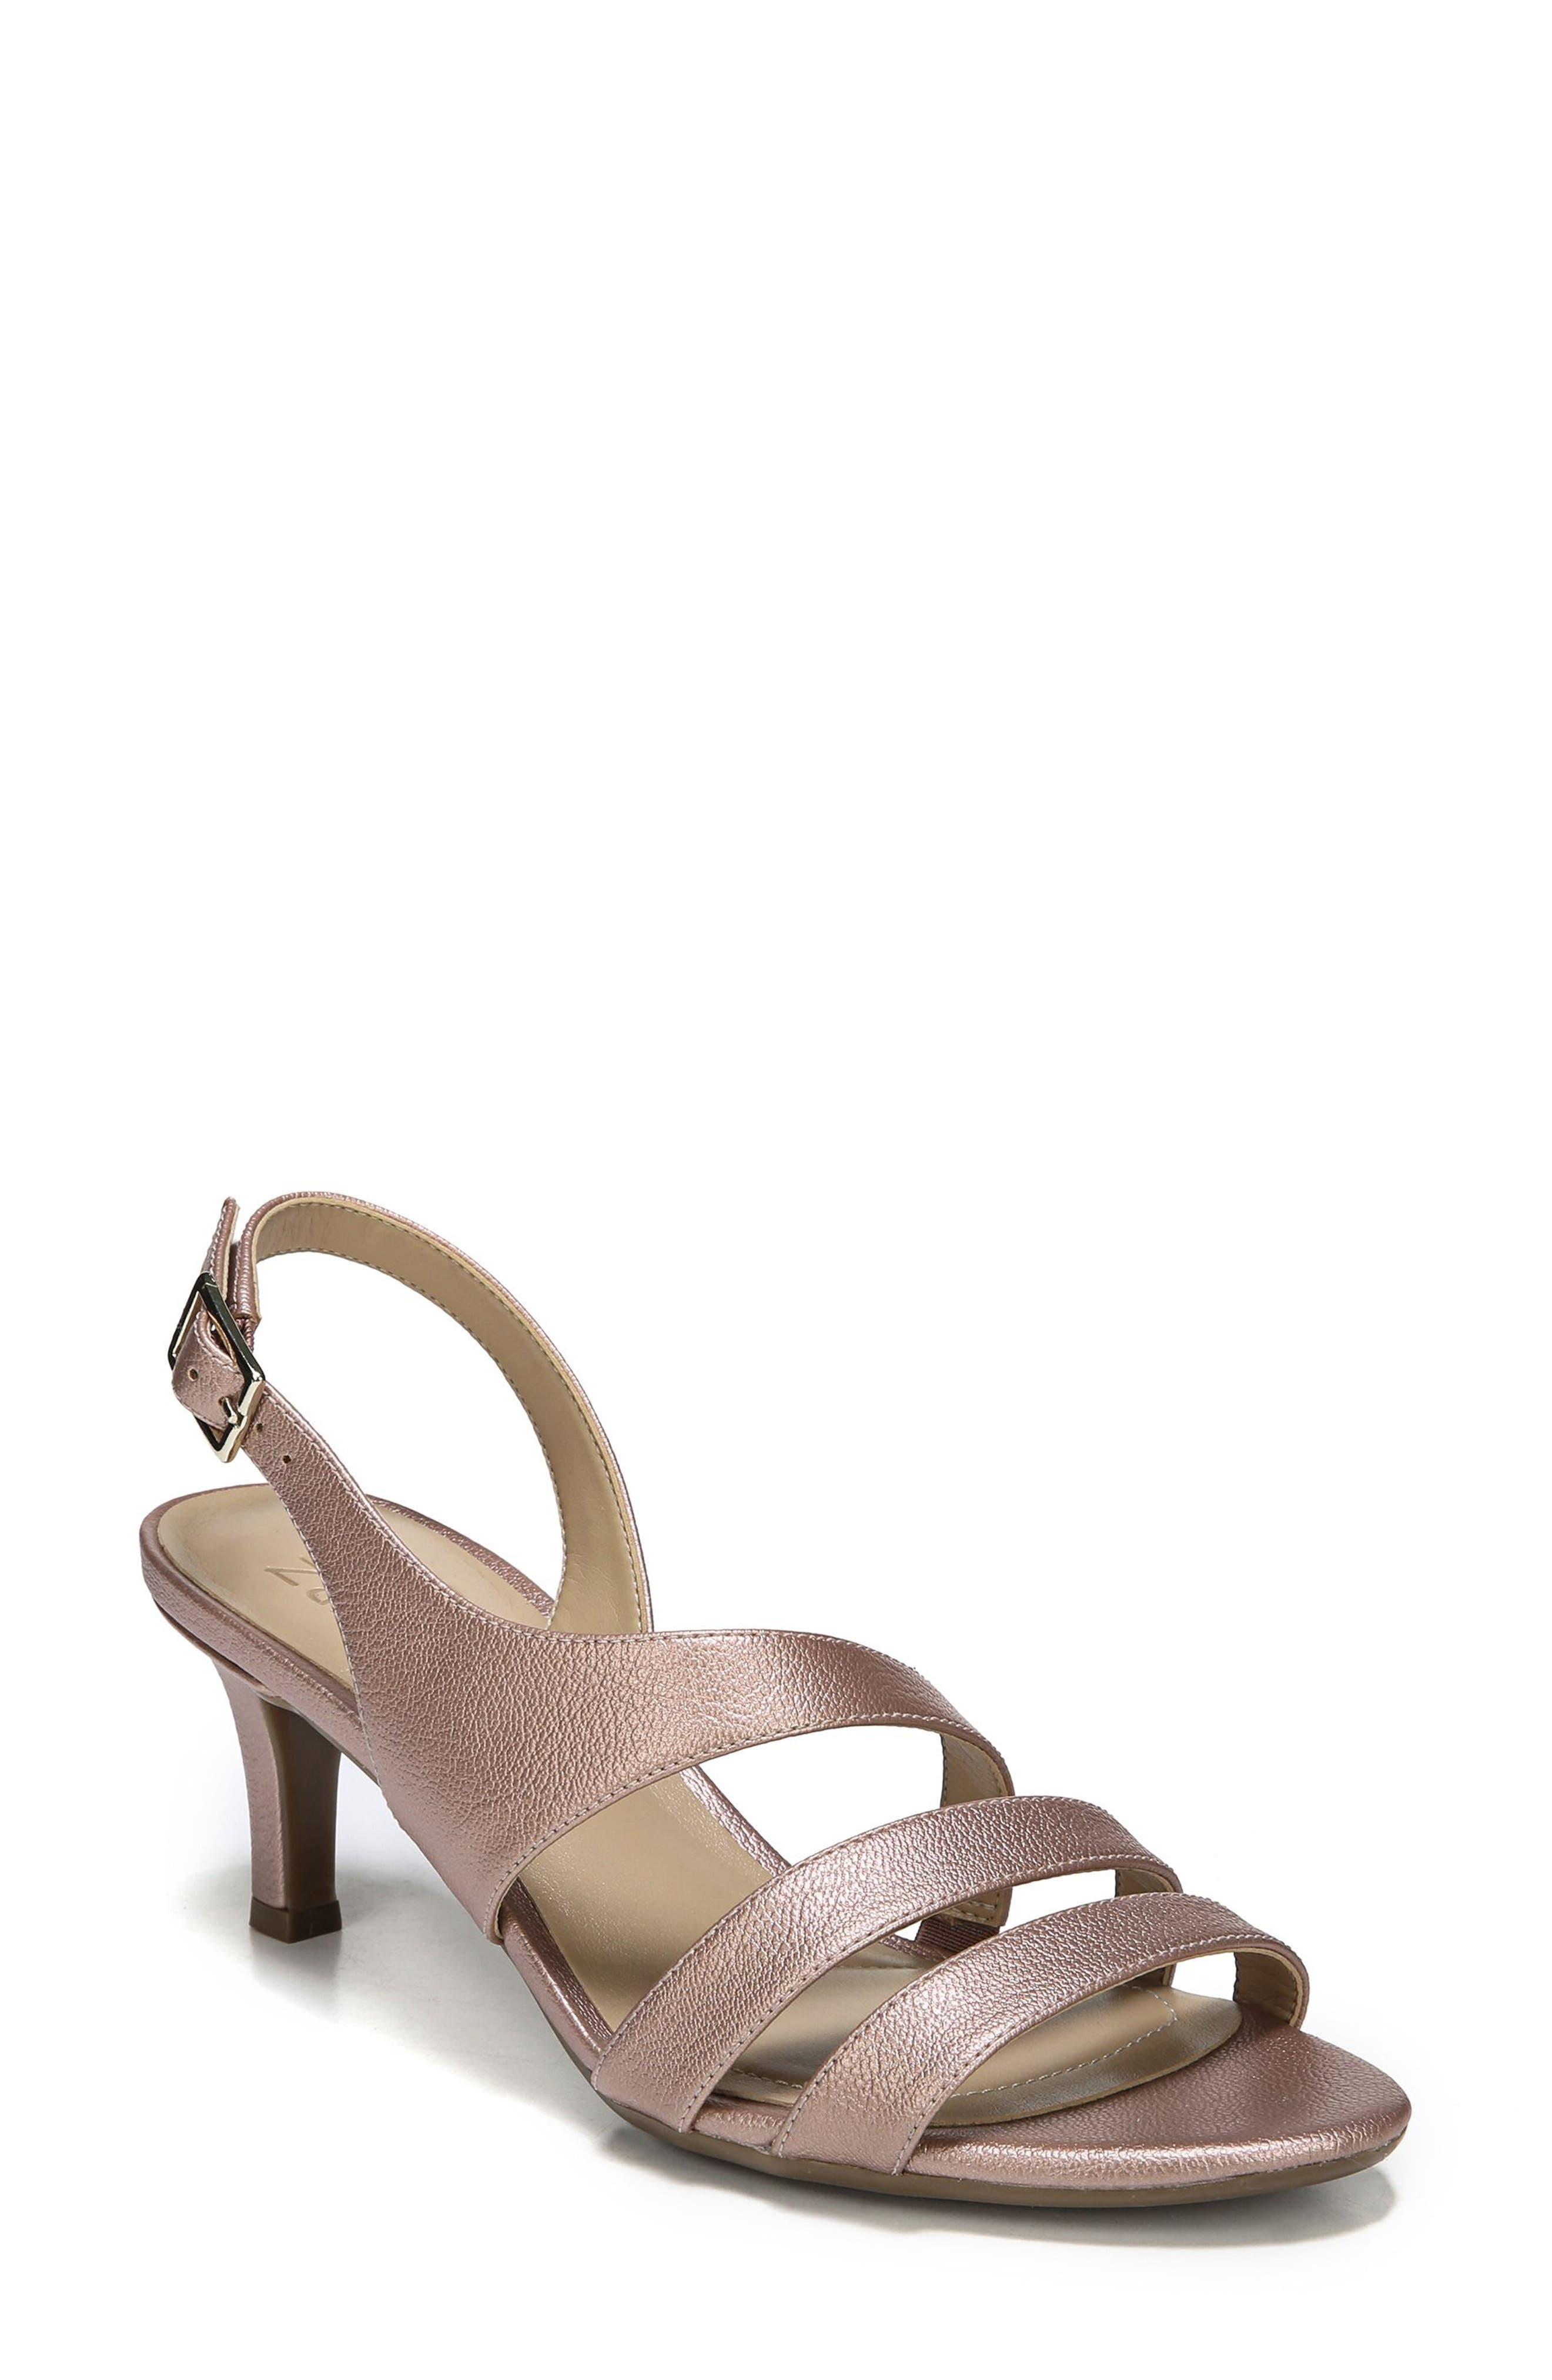 NATURALIZER Taimi Sandal, Main, color, ROSE GOLD FABRIC